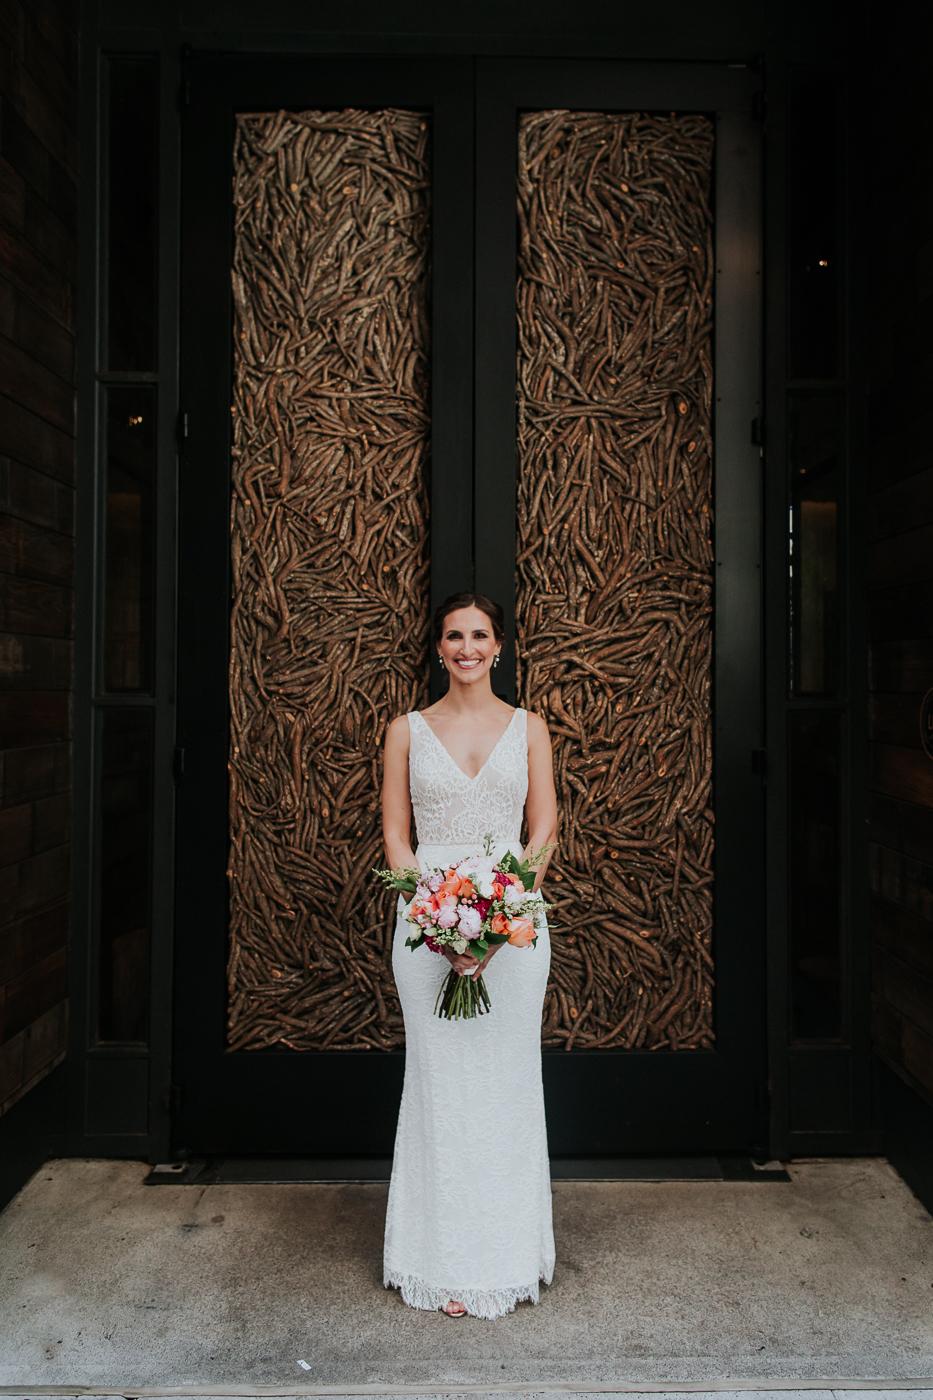 NYC-Central-Park-Conservatory-Garden-Intimate-Elopement-Documentary-Wedding-Photographer-11.jpg